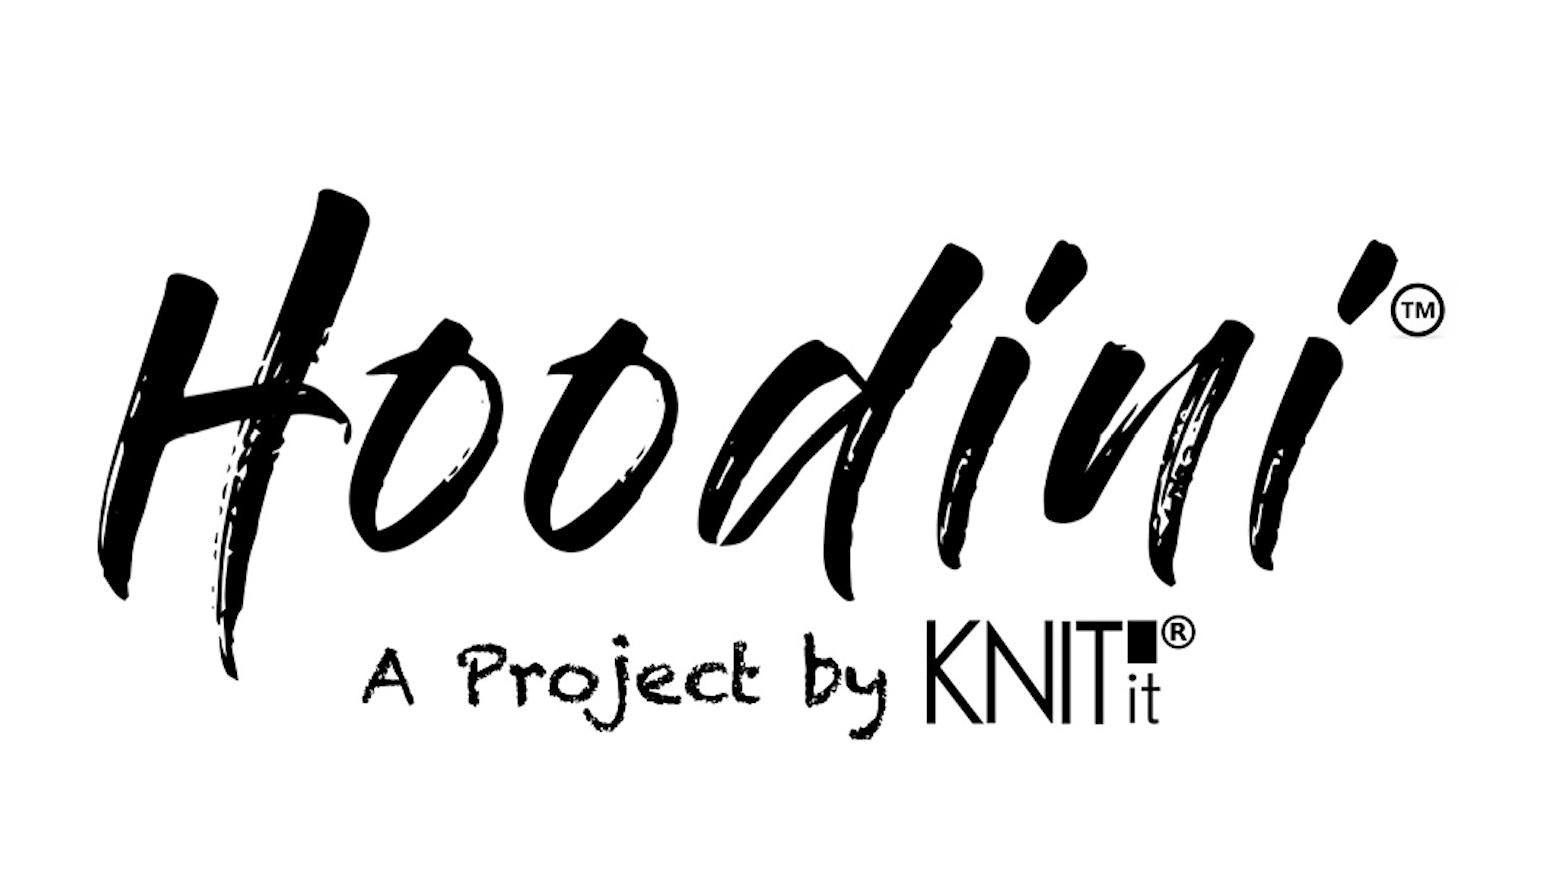 Hoodini™ 3D Knit Baby Swaddle Sleep Sack by Liz —Kickstarter